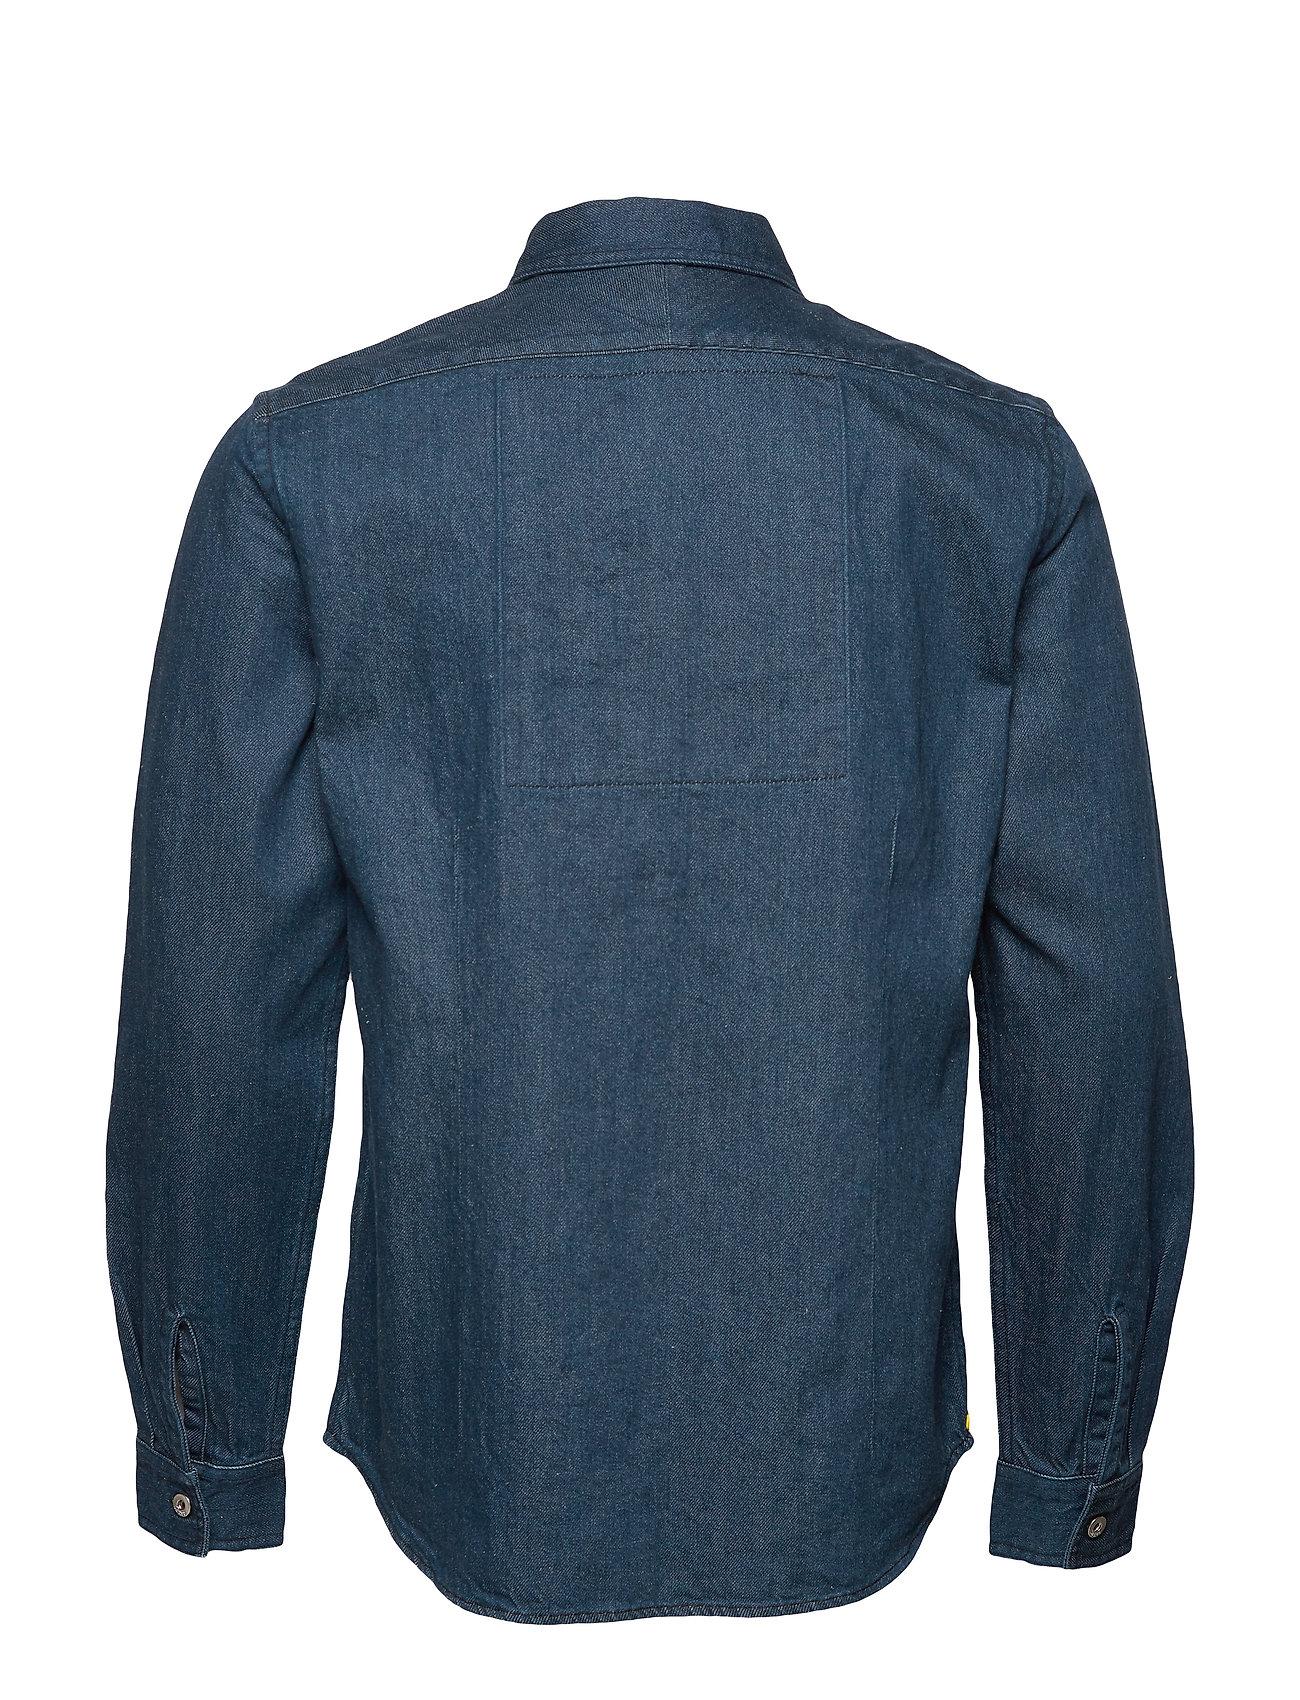 SCOTCH & SODA Hemden | Lot 22 Popover Denim Worker Shirt With Contrast Zipper Hemd Casual Blau SCOTCH & SODA